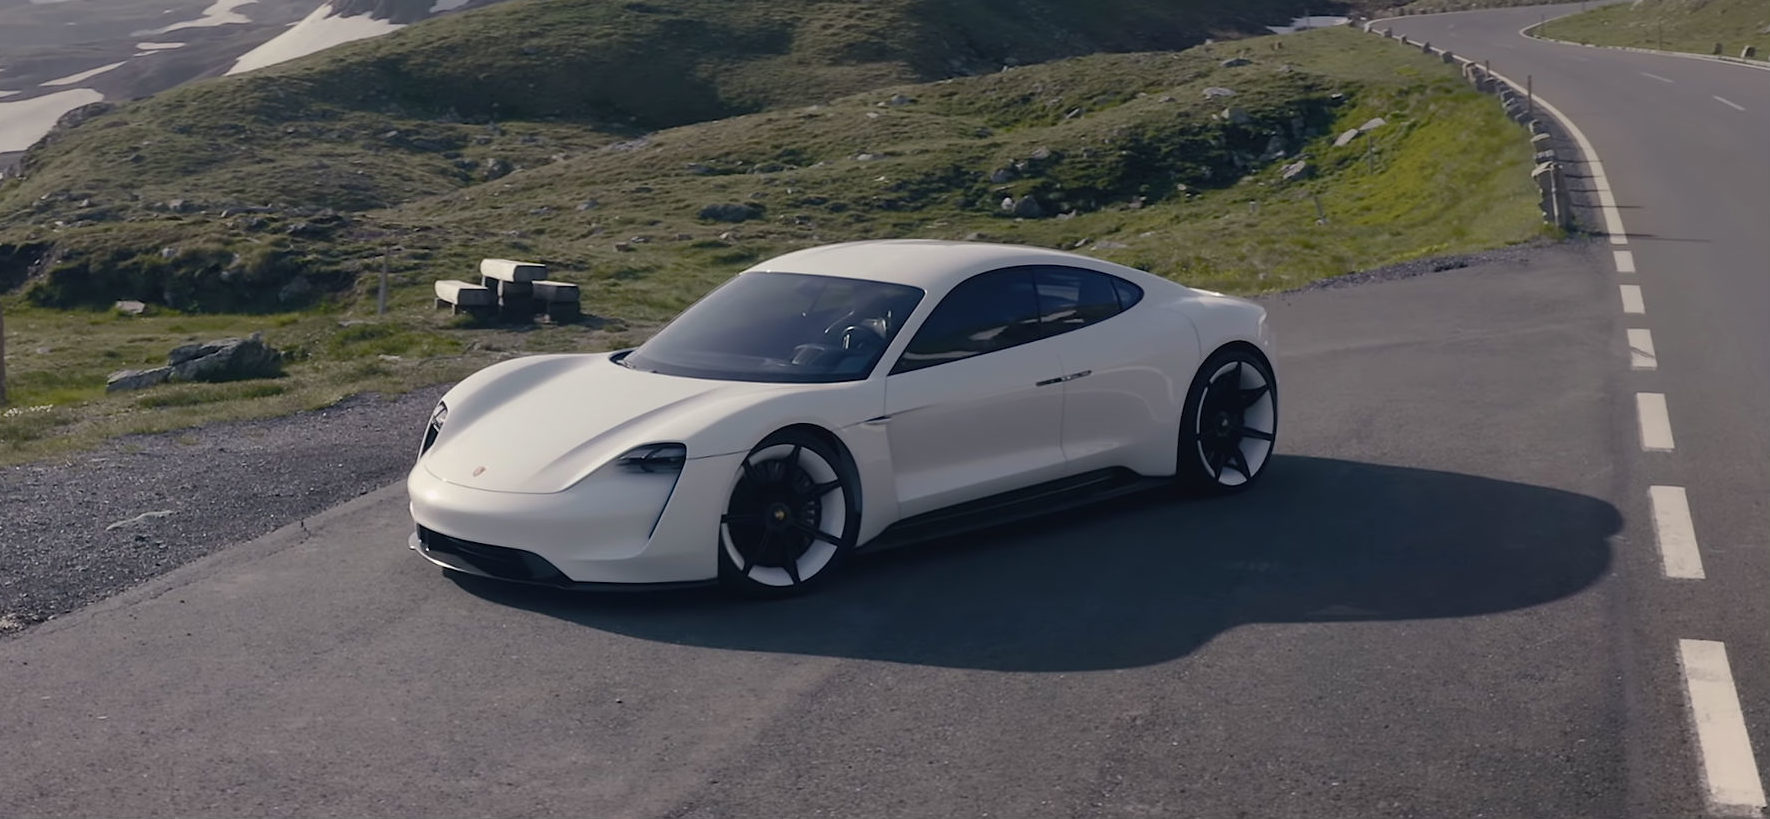 Porsche sprema Taycan za brzi krug na Nirburgringu